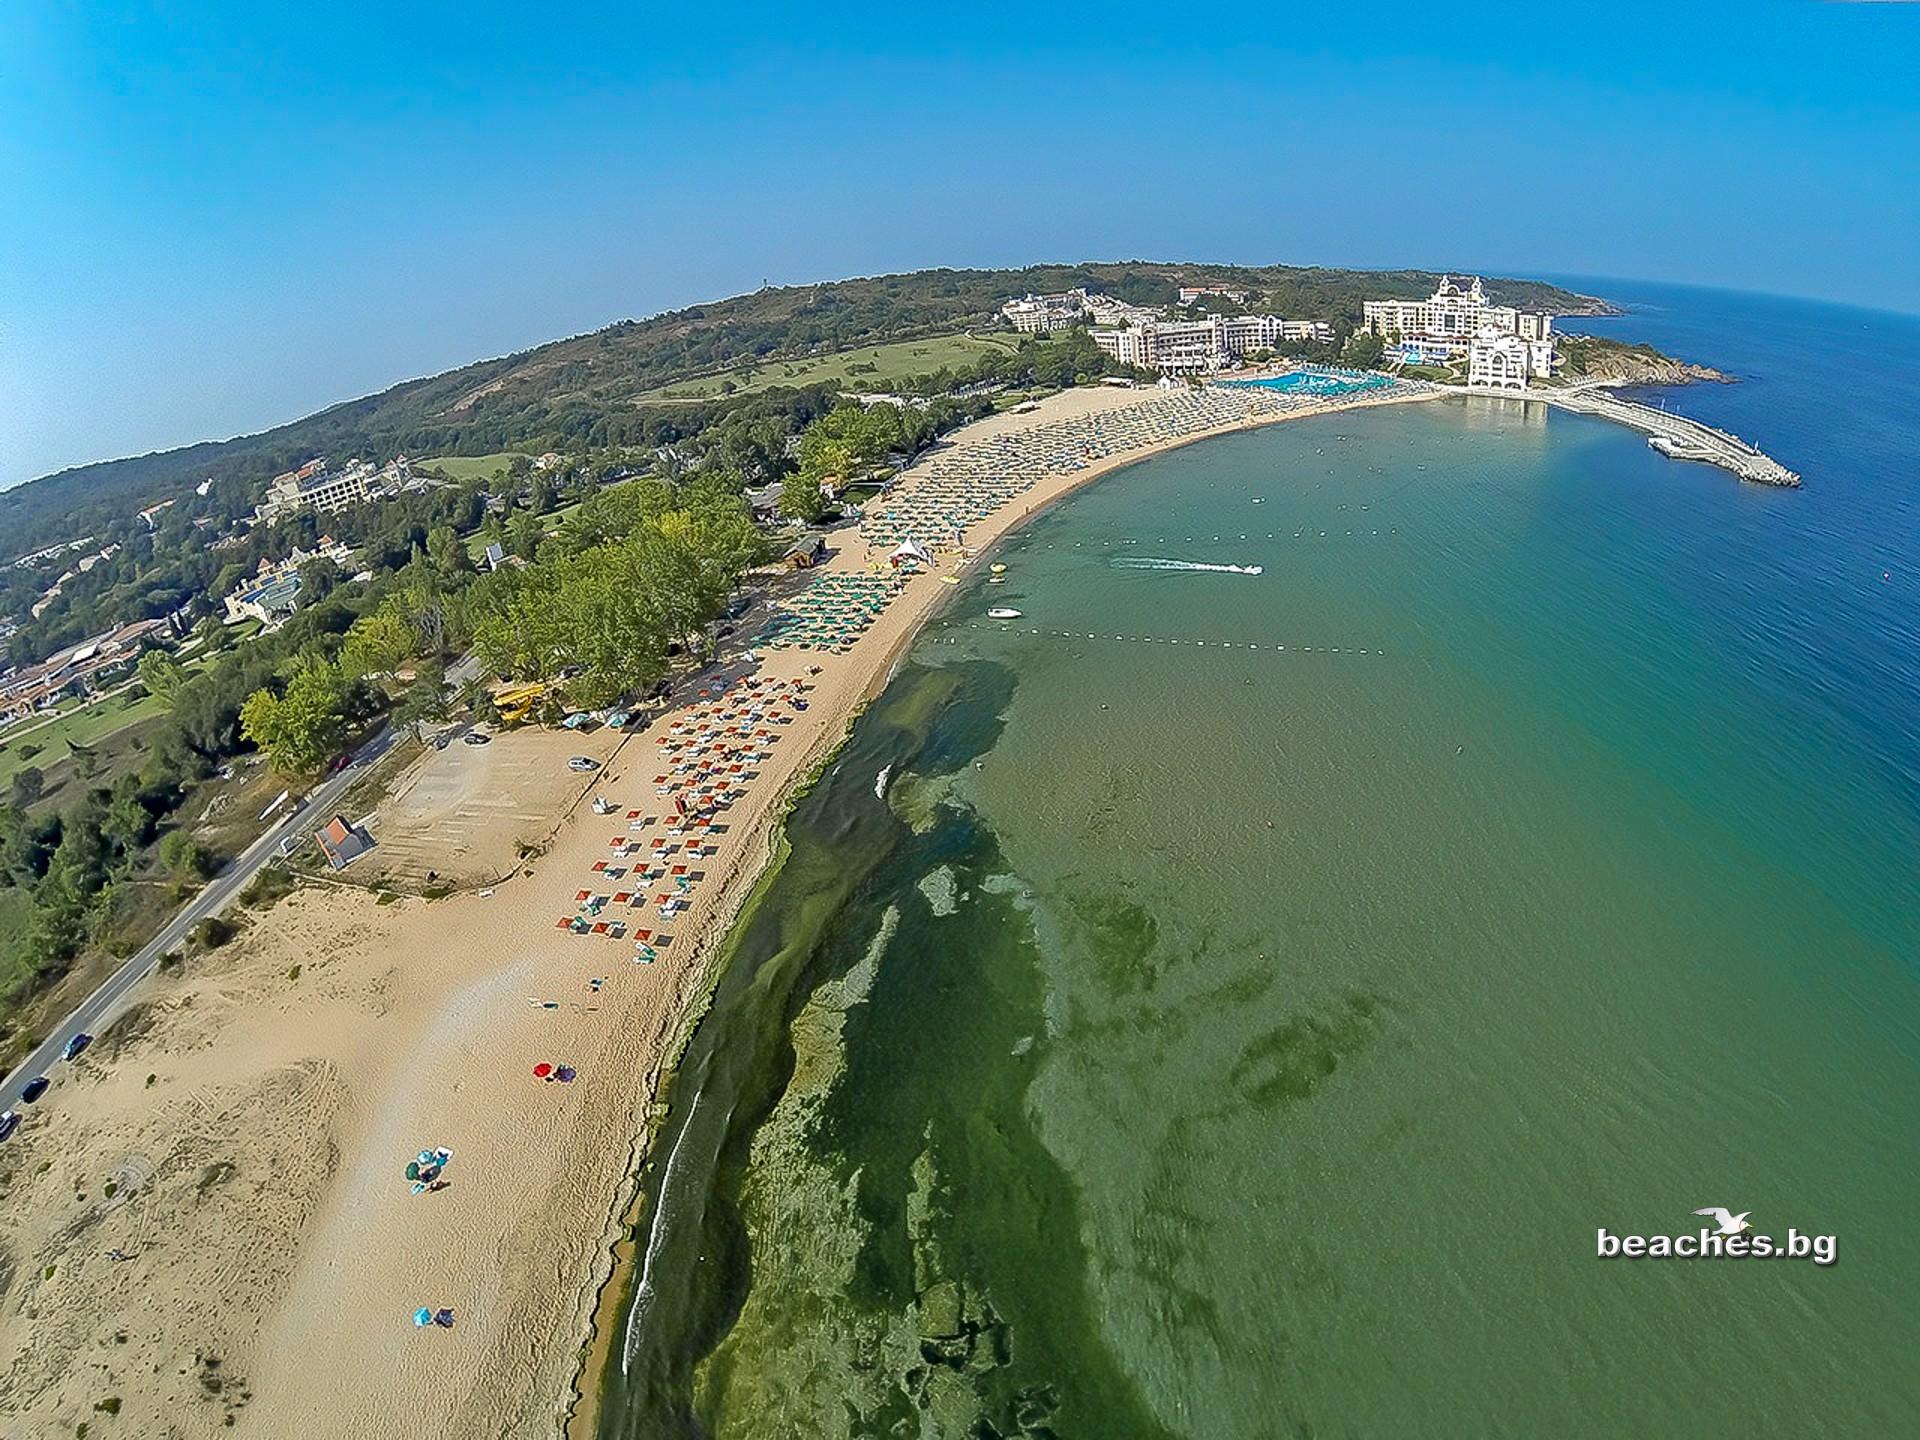 beaches.bg - Плаж Дюни, България